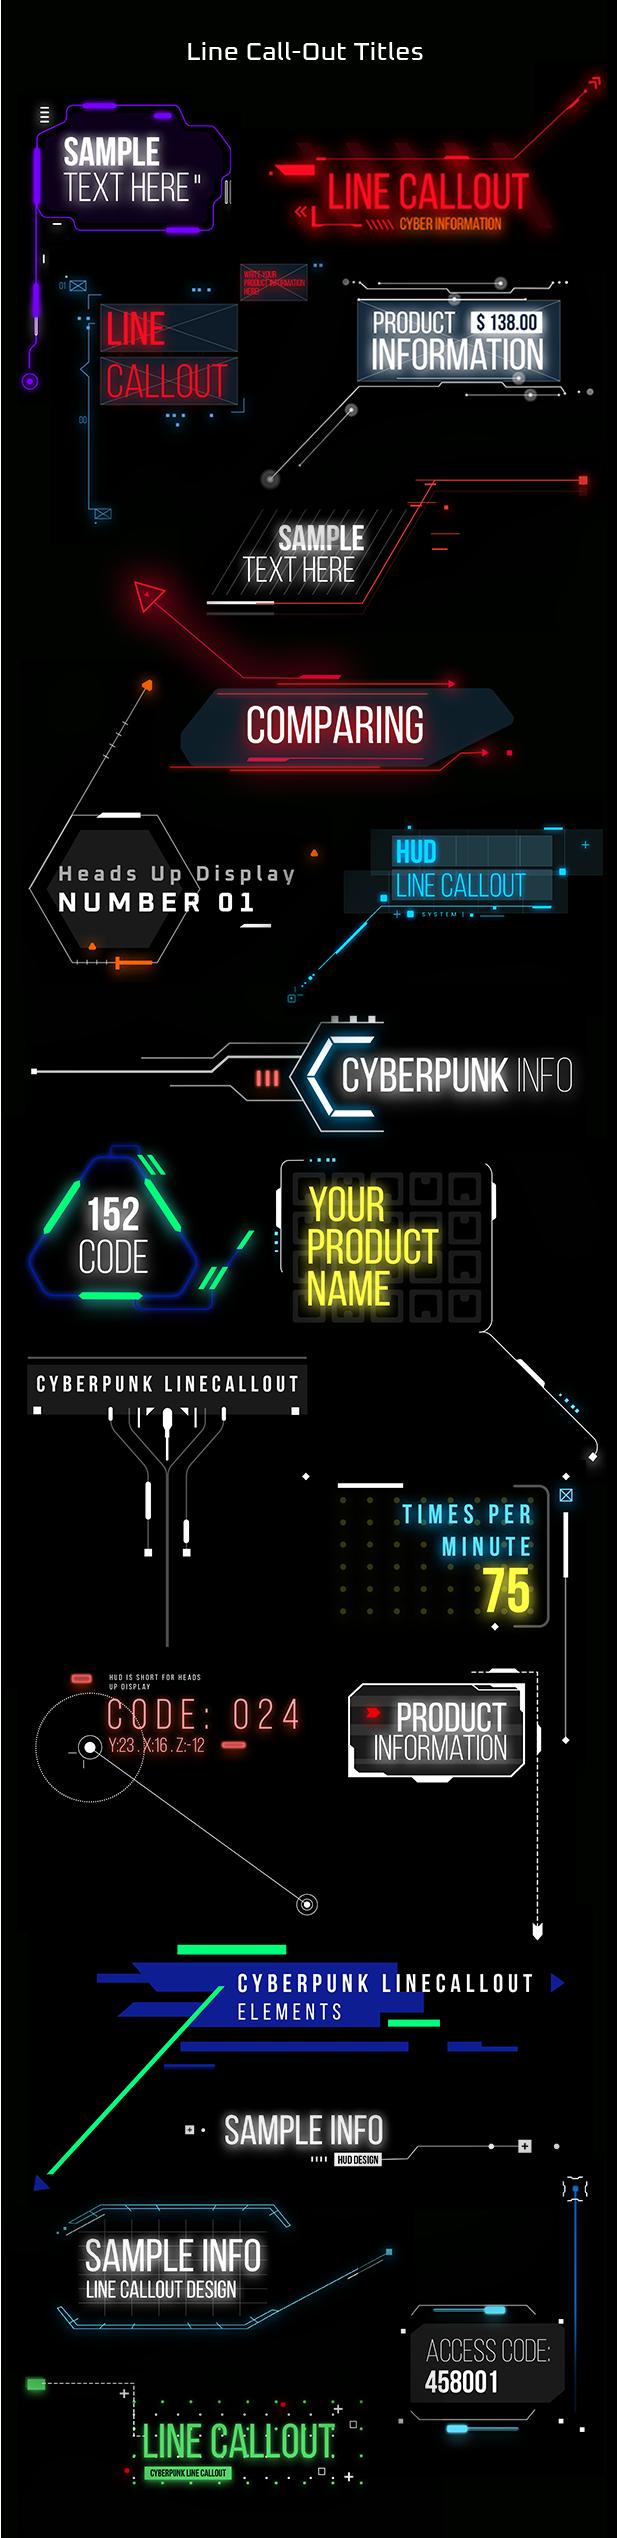 AE脚本-赛博朋克未来科幻霓虹灯发光文本标题背景动态工具包 Cyberpunk Titles Lowerthirds and Backgrounds插图4